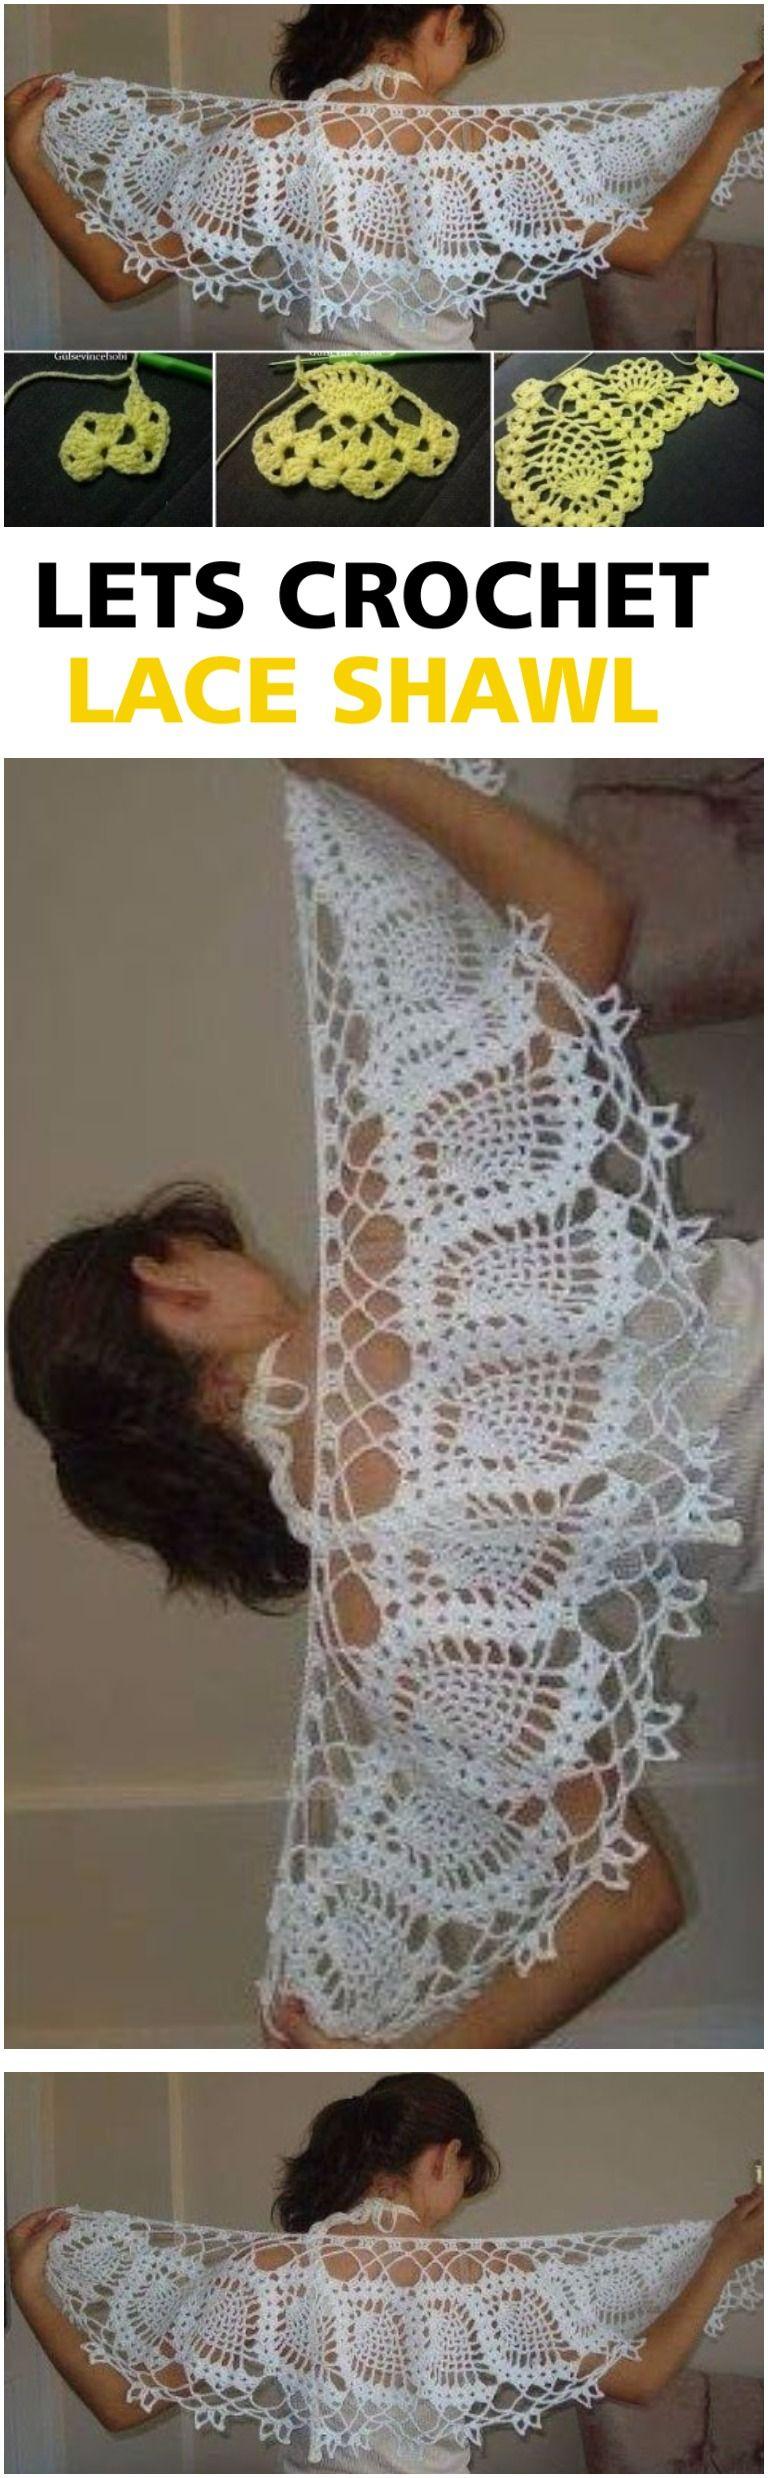 Crochet Lace Shawl Tutorial